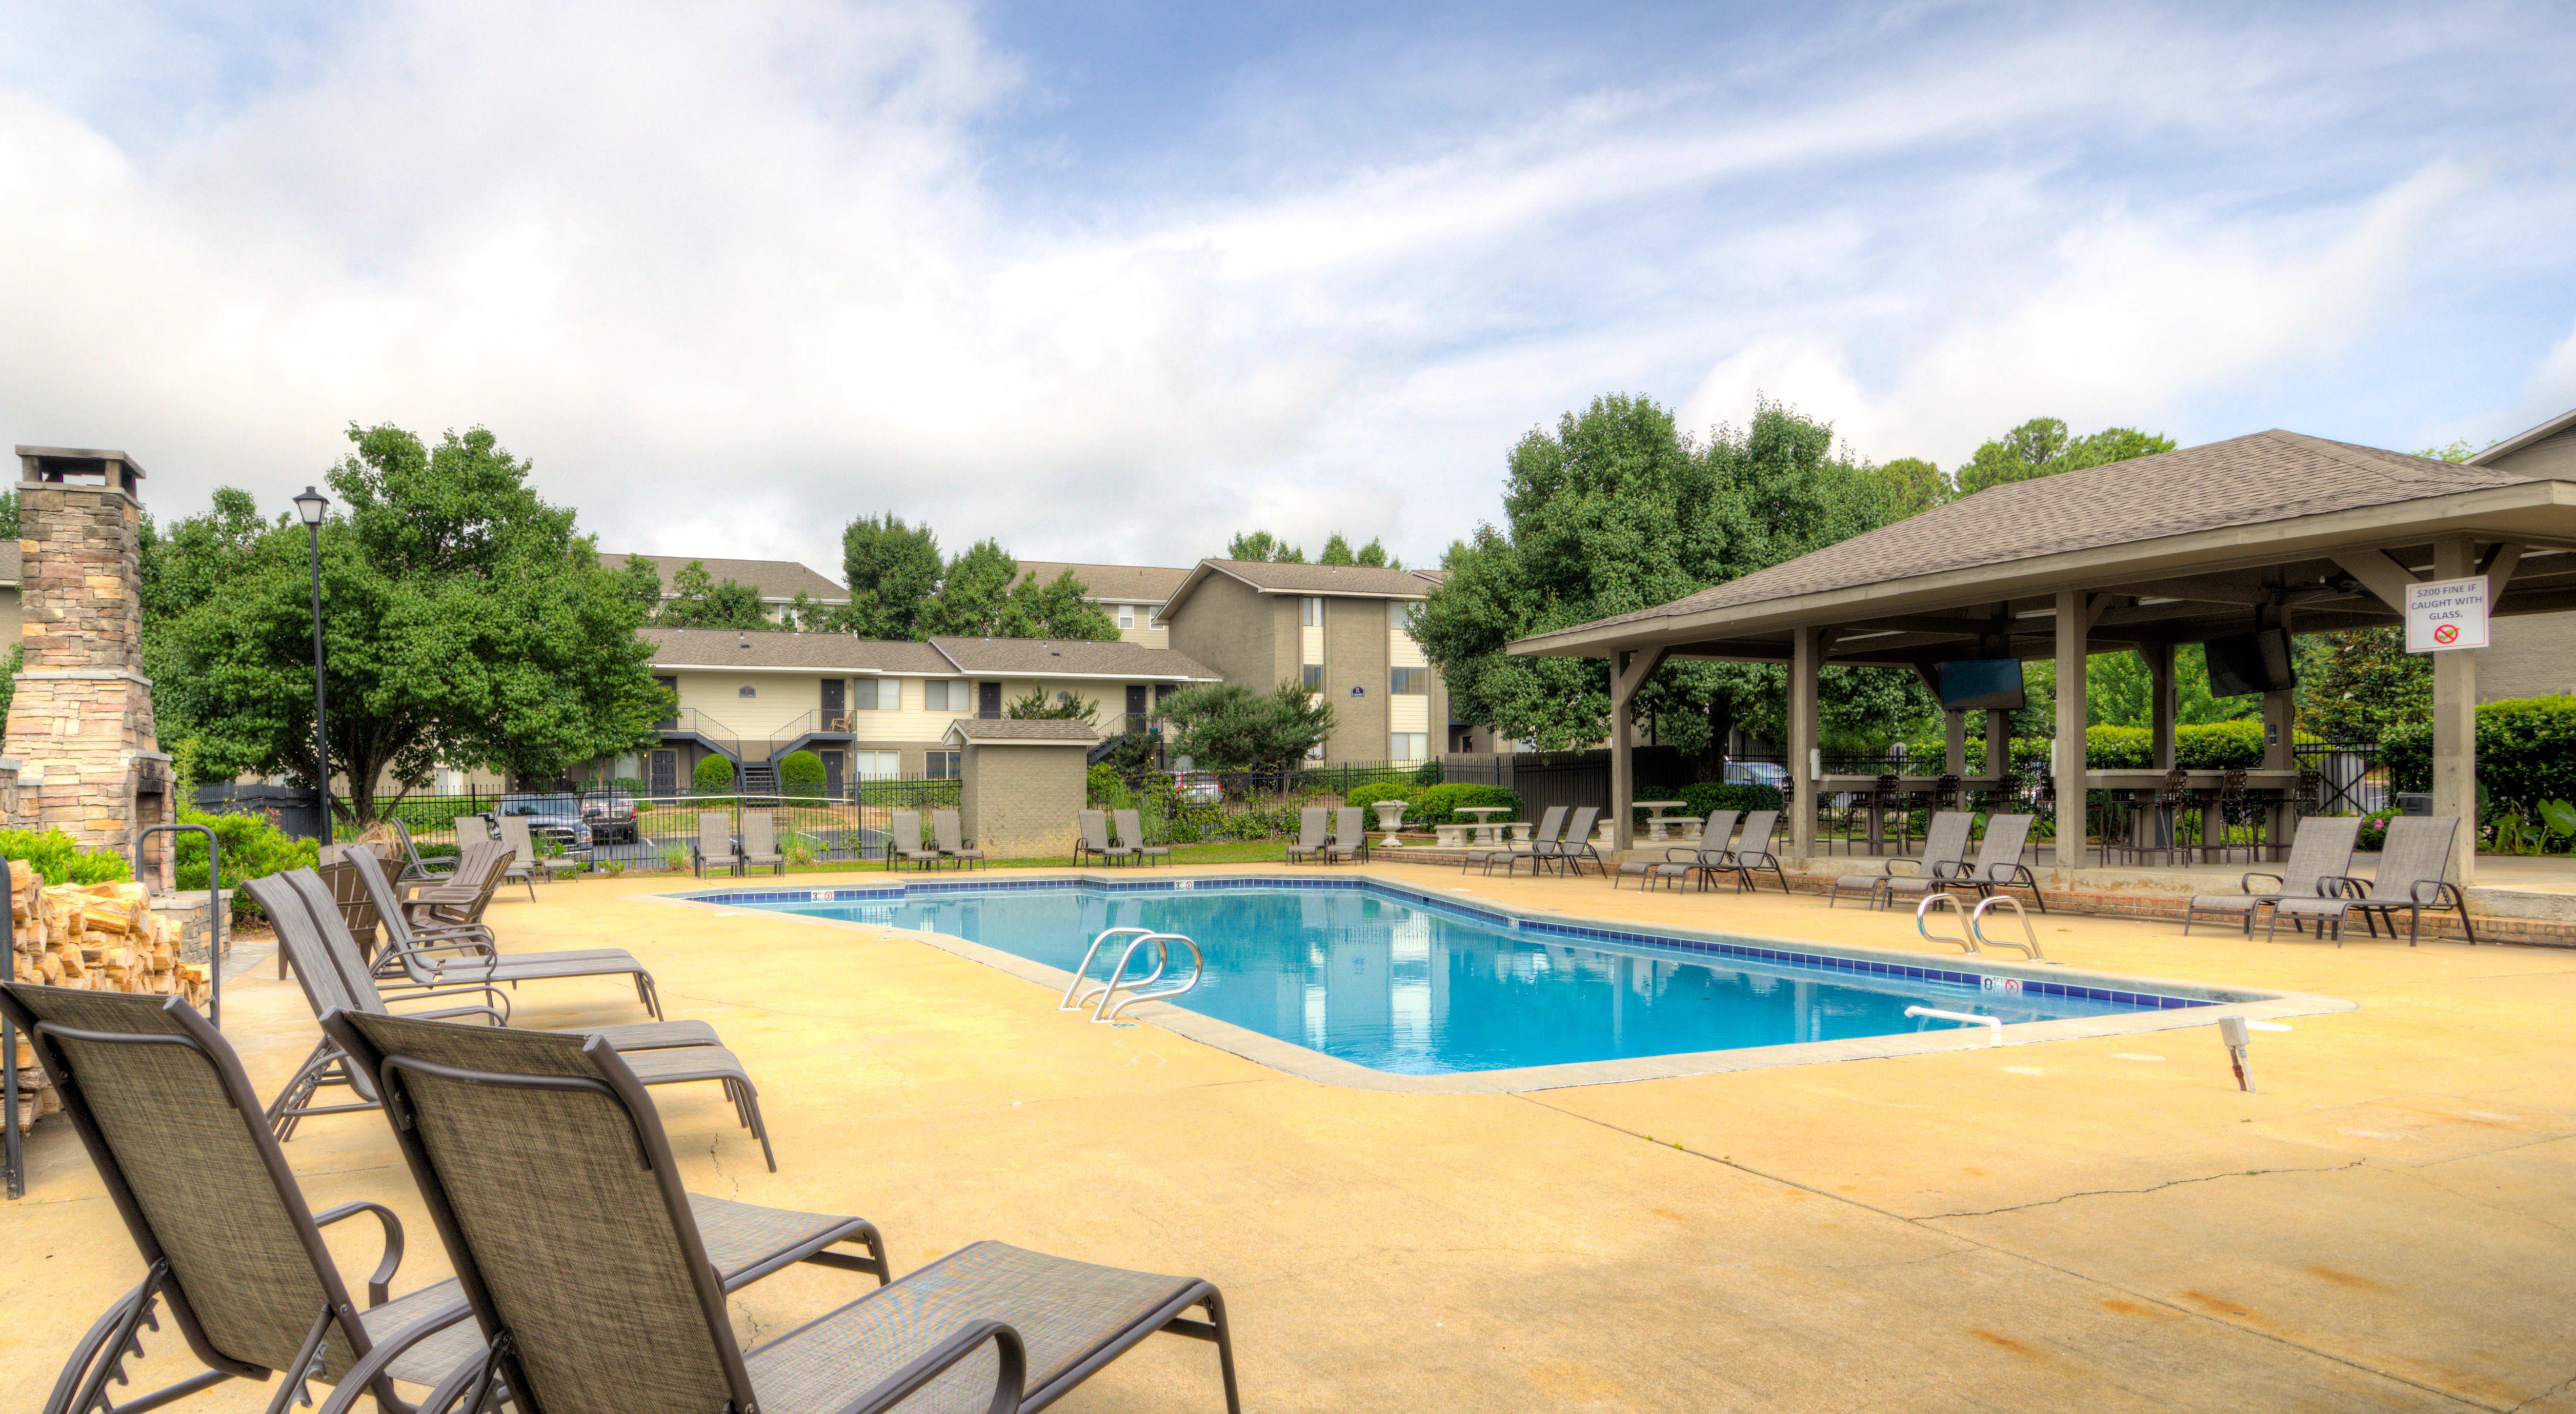 Apartments in Auburn, AL